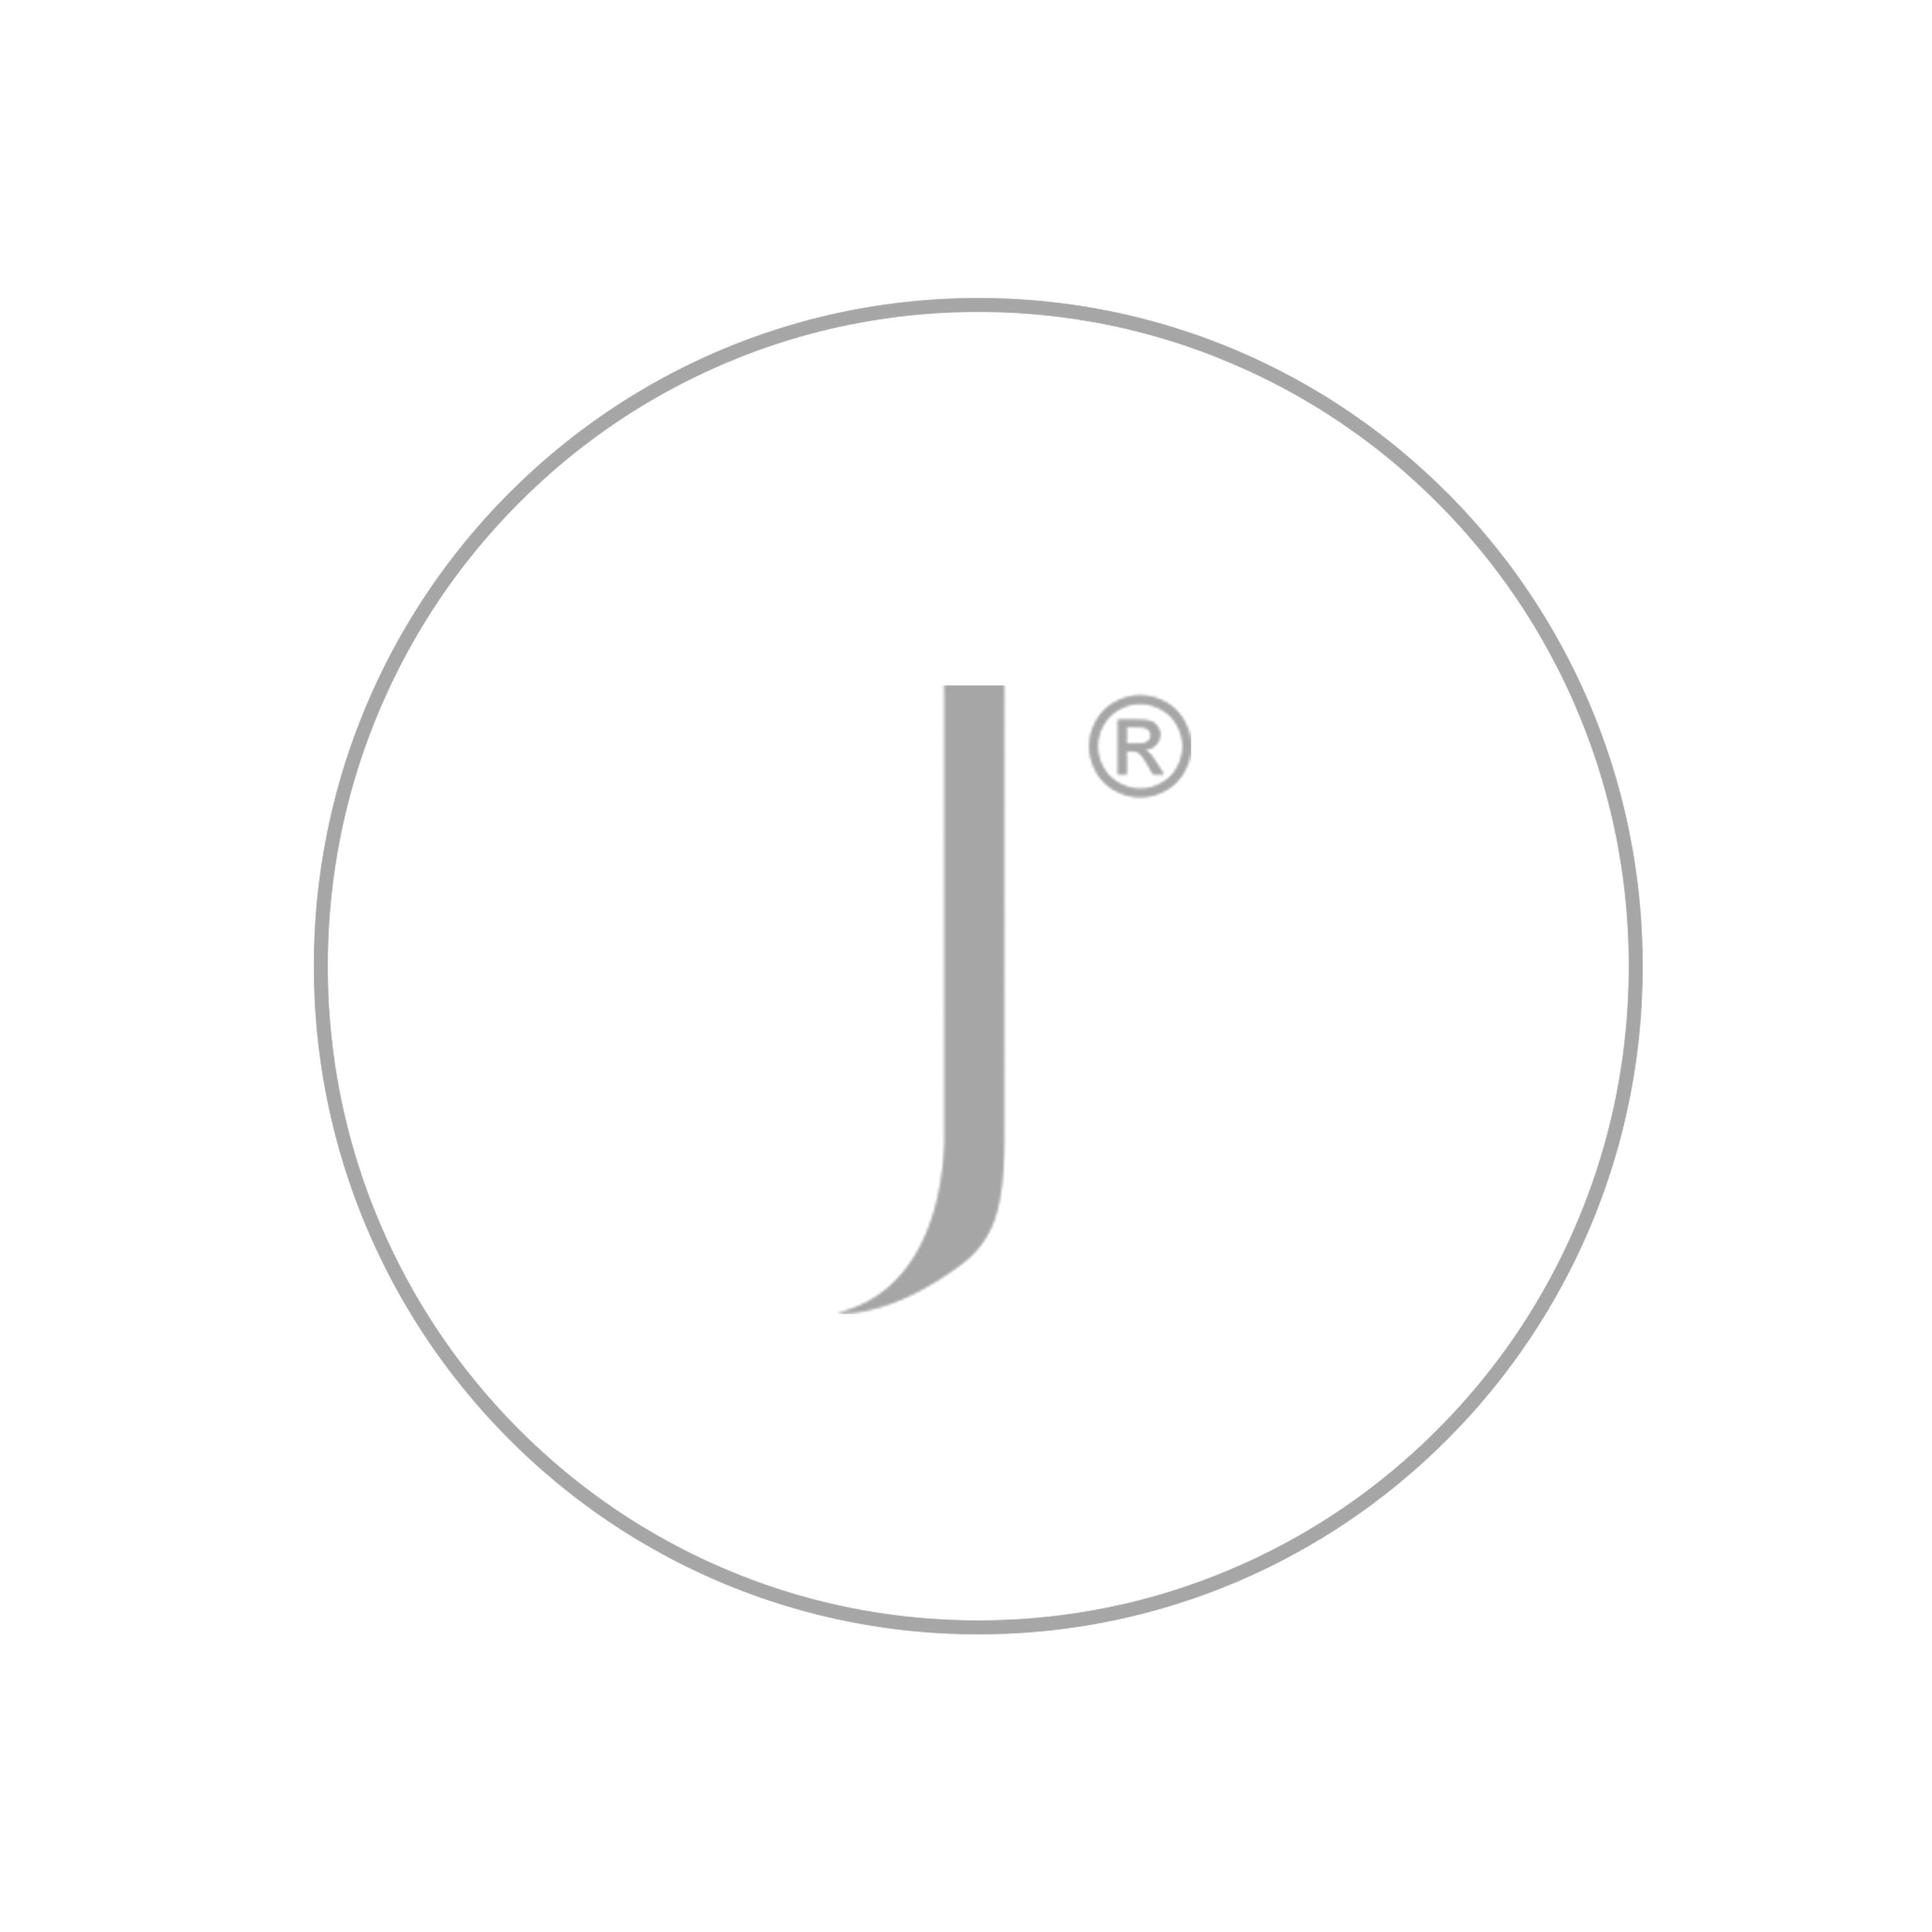 18kt Gold Drop Earrings In Turquoise - December Birthstone